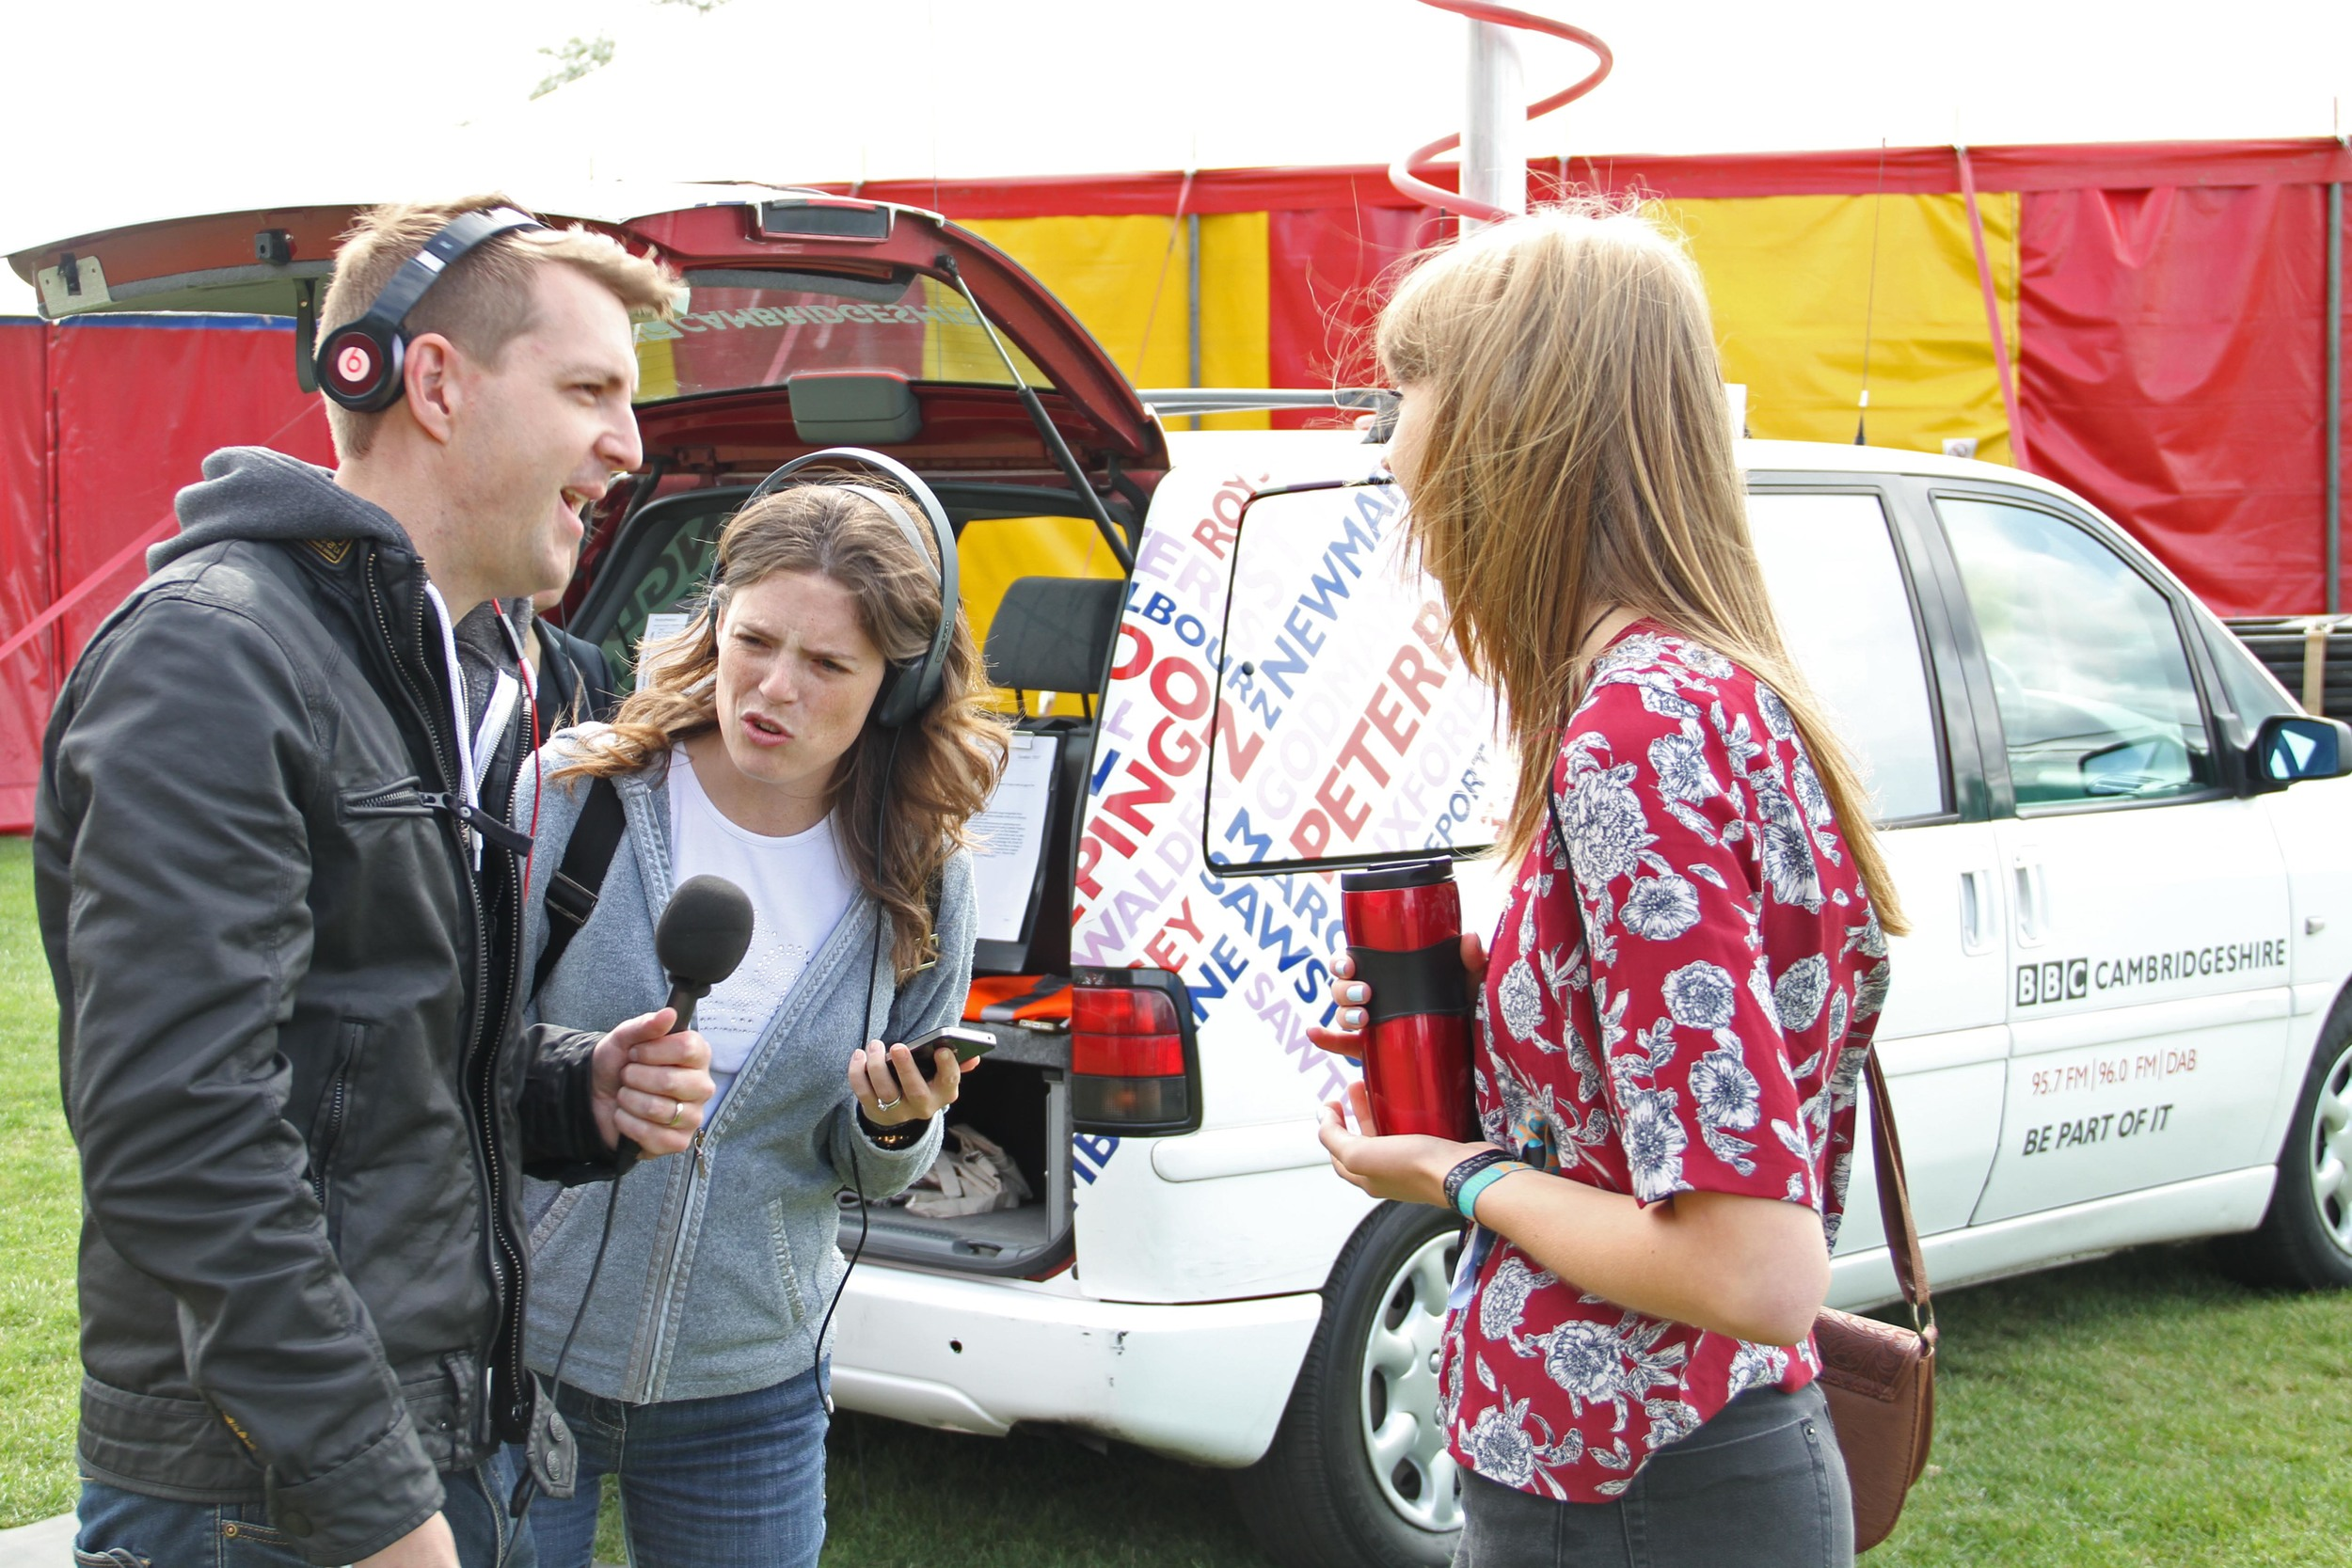 Rachel Clark - BBC Radio Cambridgeshire - Nick Carter - LodeStar 2014 - 4.JPG